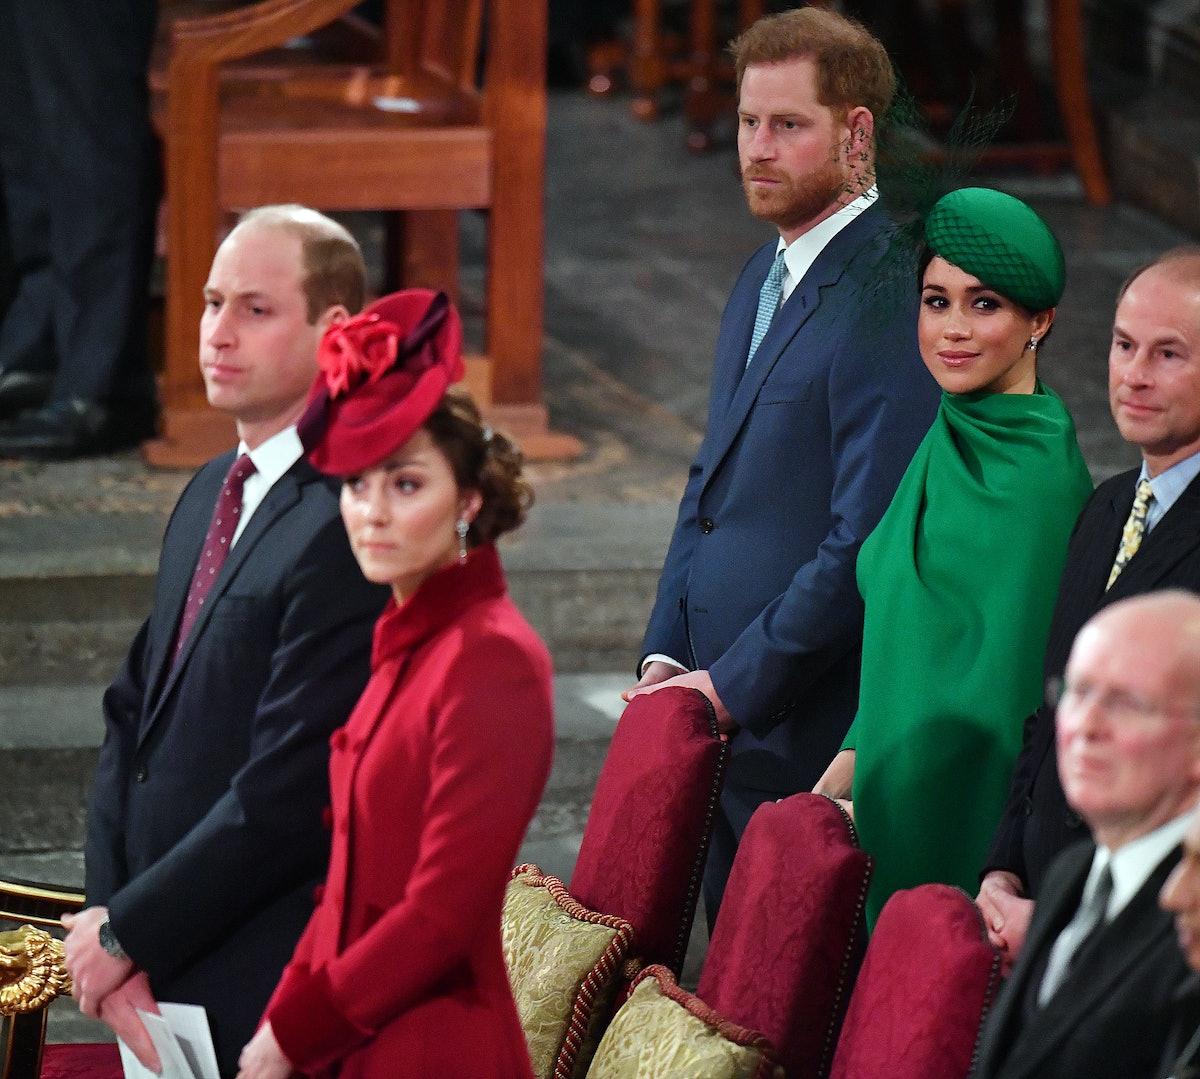 LONDON, ENGLAND - MARCH 09: Prince William, Duke of Cambridge, Catherine, Duchess of Cambridge, Prin...